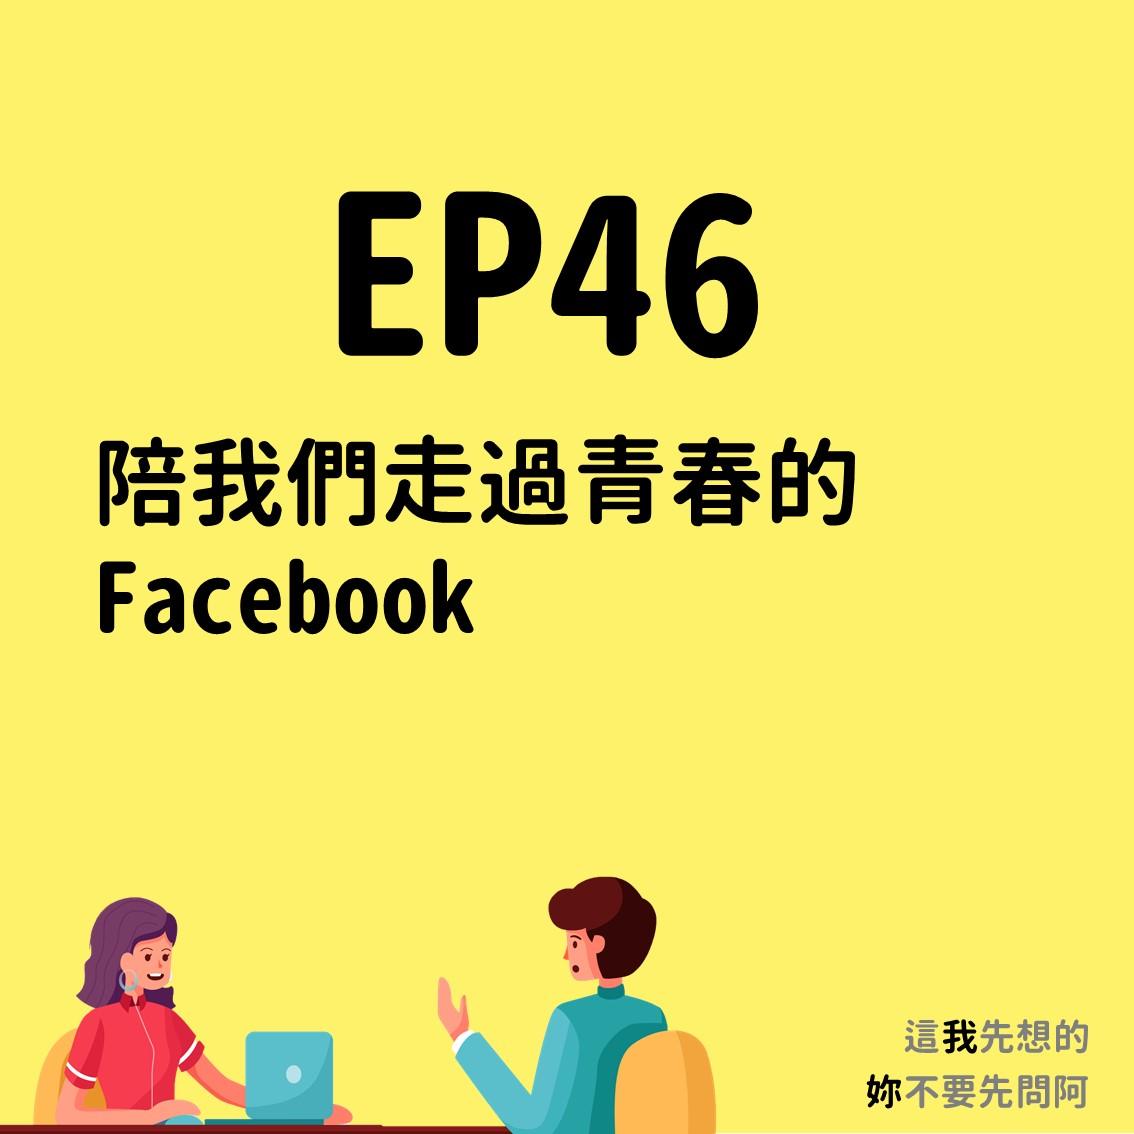 EP46 陪我們走過青春的Facebook